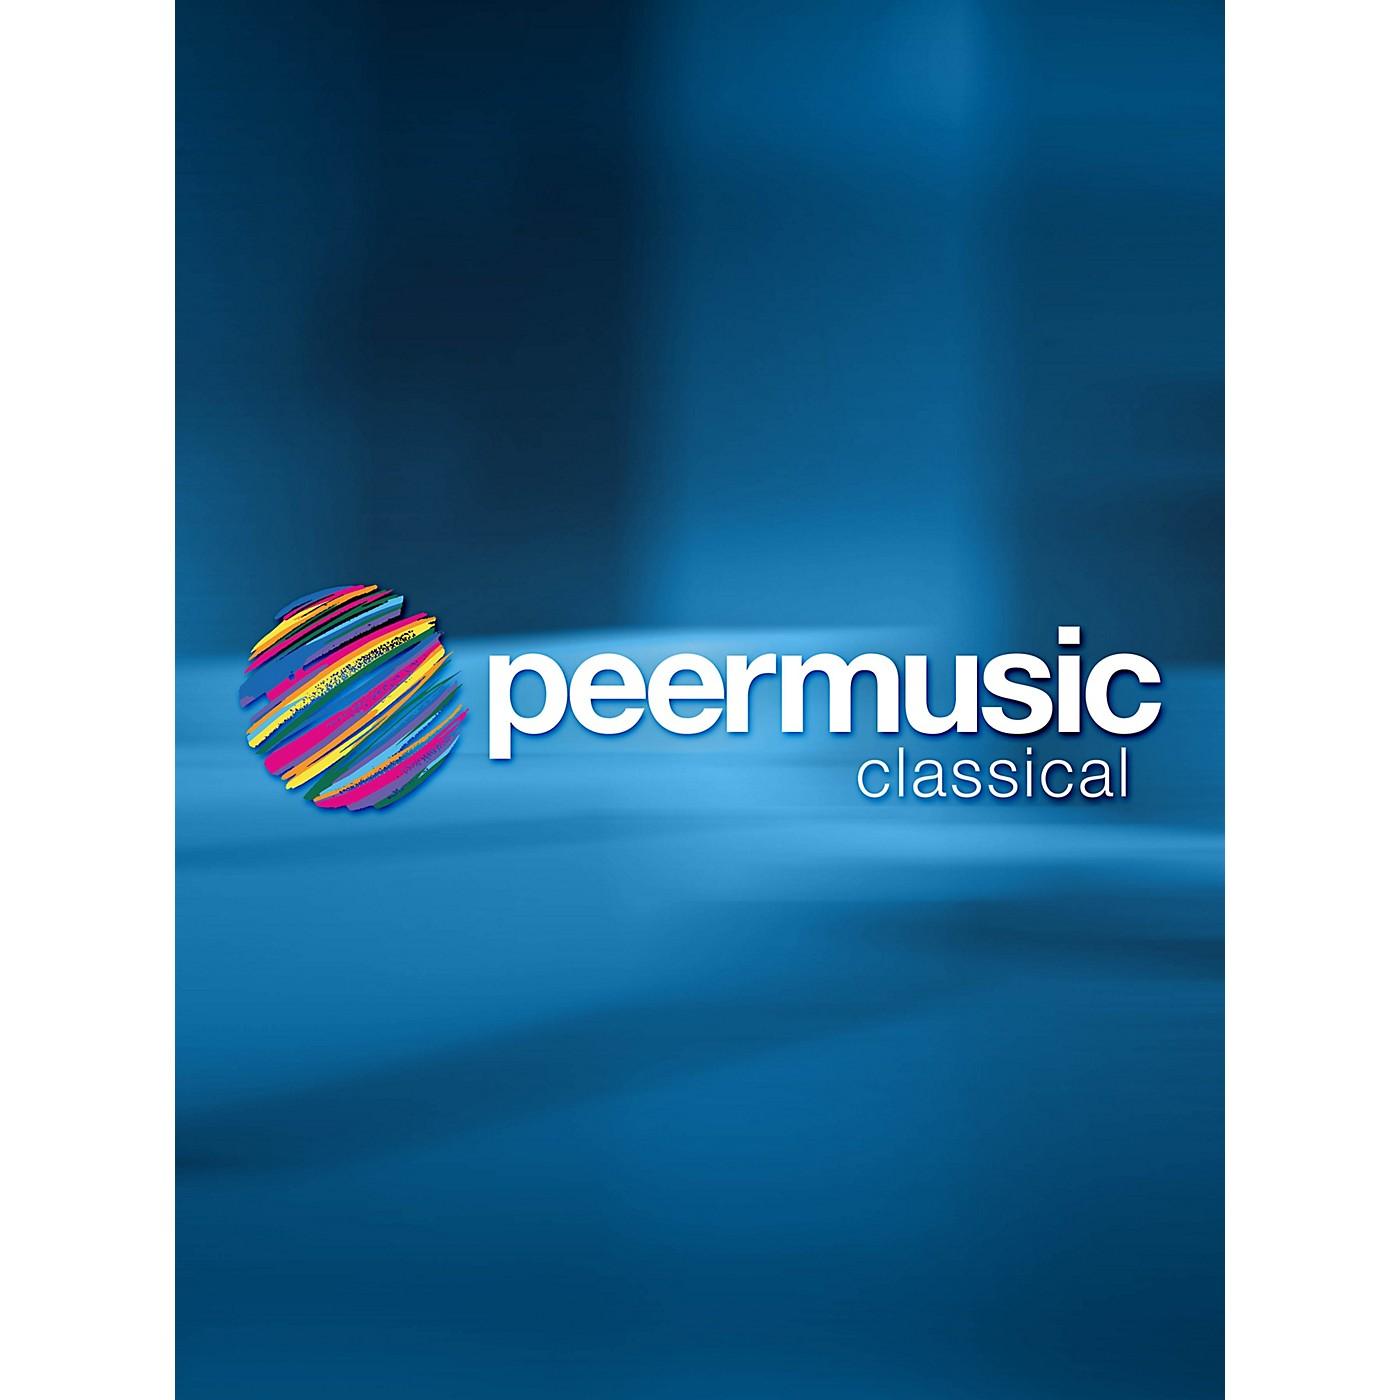 Peer Music Music for Brass Instruments (Brass Ensemble) Peermusic Classical Series Book  by Arthur Cohn thumbnail